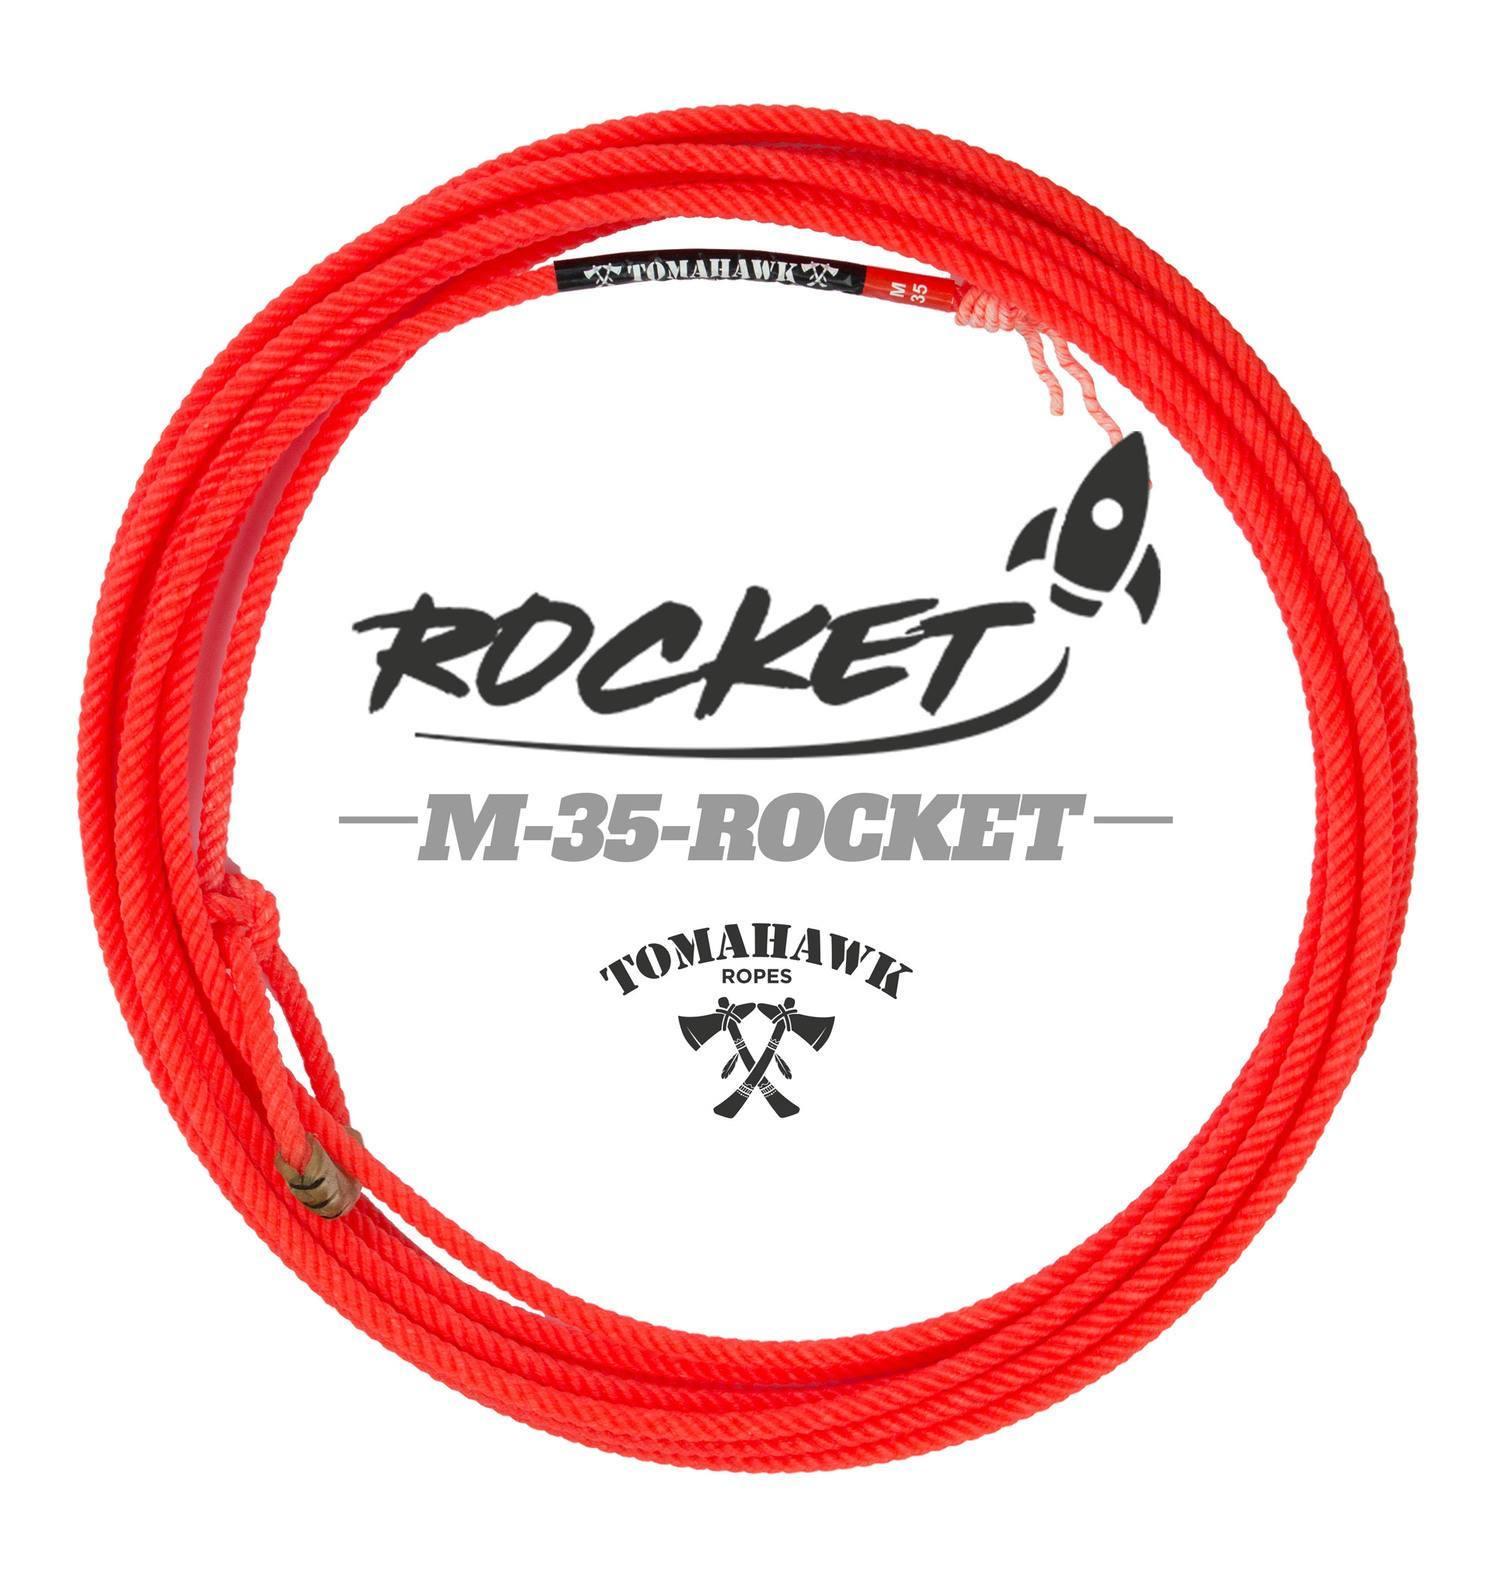 Corda Pé Tomahawk M 35 Rocket